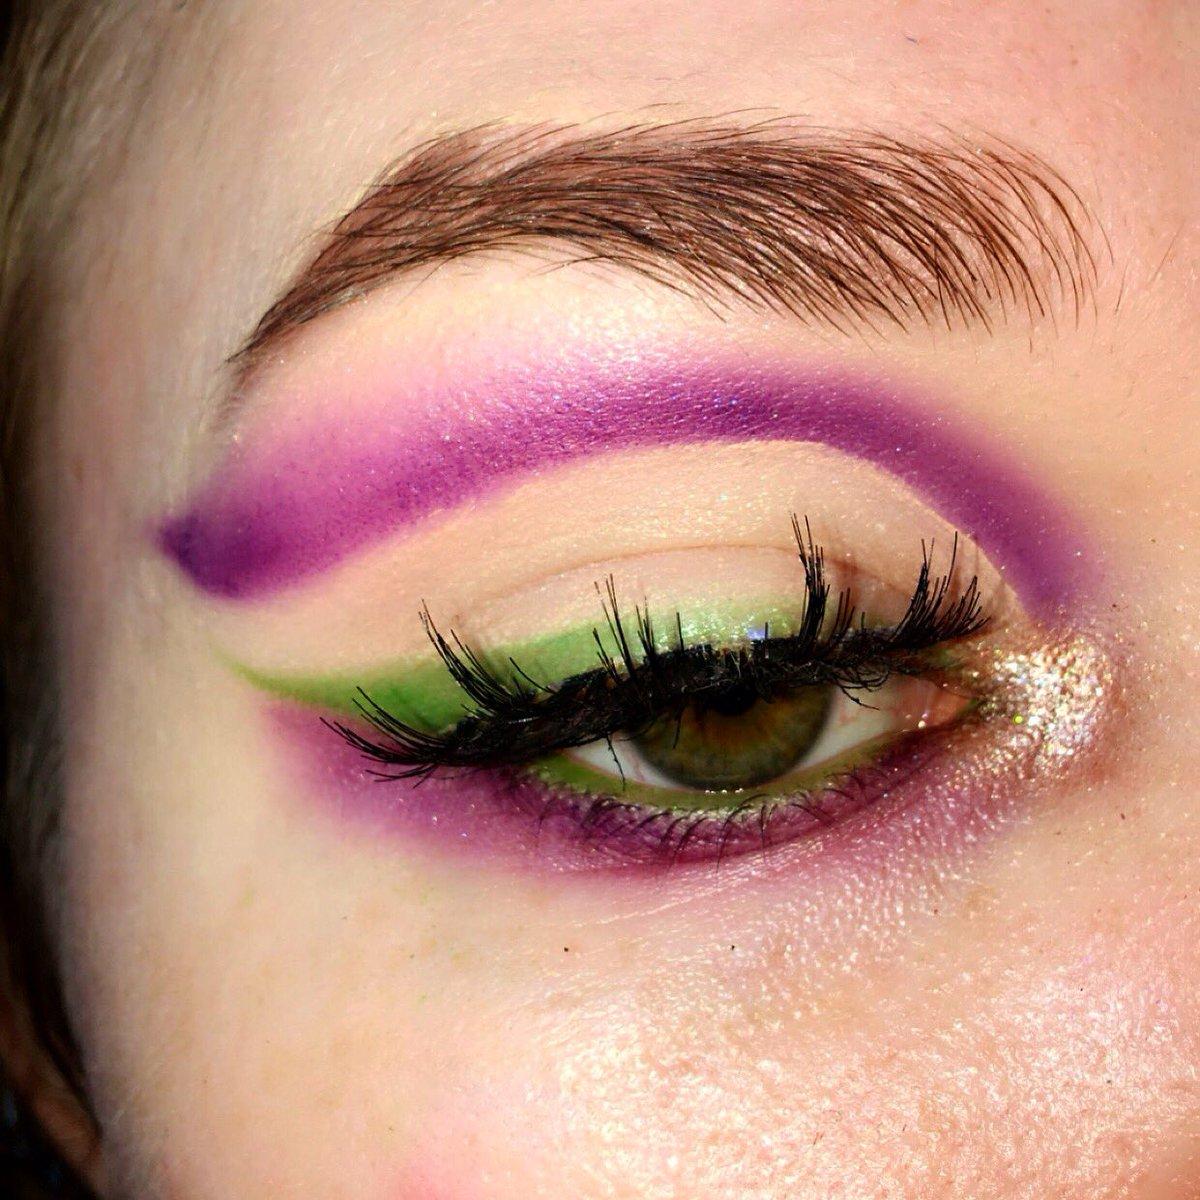 Mardi Gras@bhcosmetics aurora lights palette @morphebrushes james charles palette @stilacosmetics highlighter opulence   #eyeshadow #makeup #MakeupAddict #makeupart #makeupoftheday  #makeupjunkie #makeupartist #stilacosmetics #bhcosmetics #morphebabe #MardiGras2020pic.twitter.com/hjqply2p44